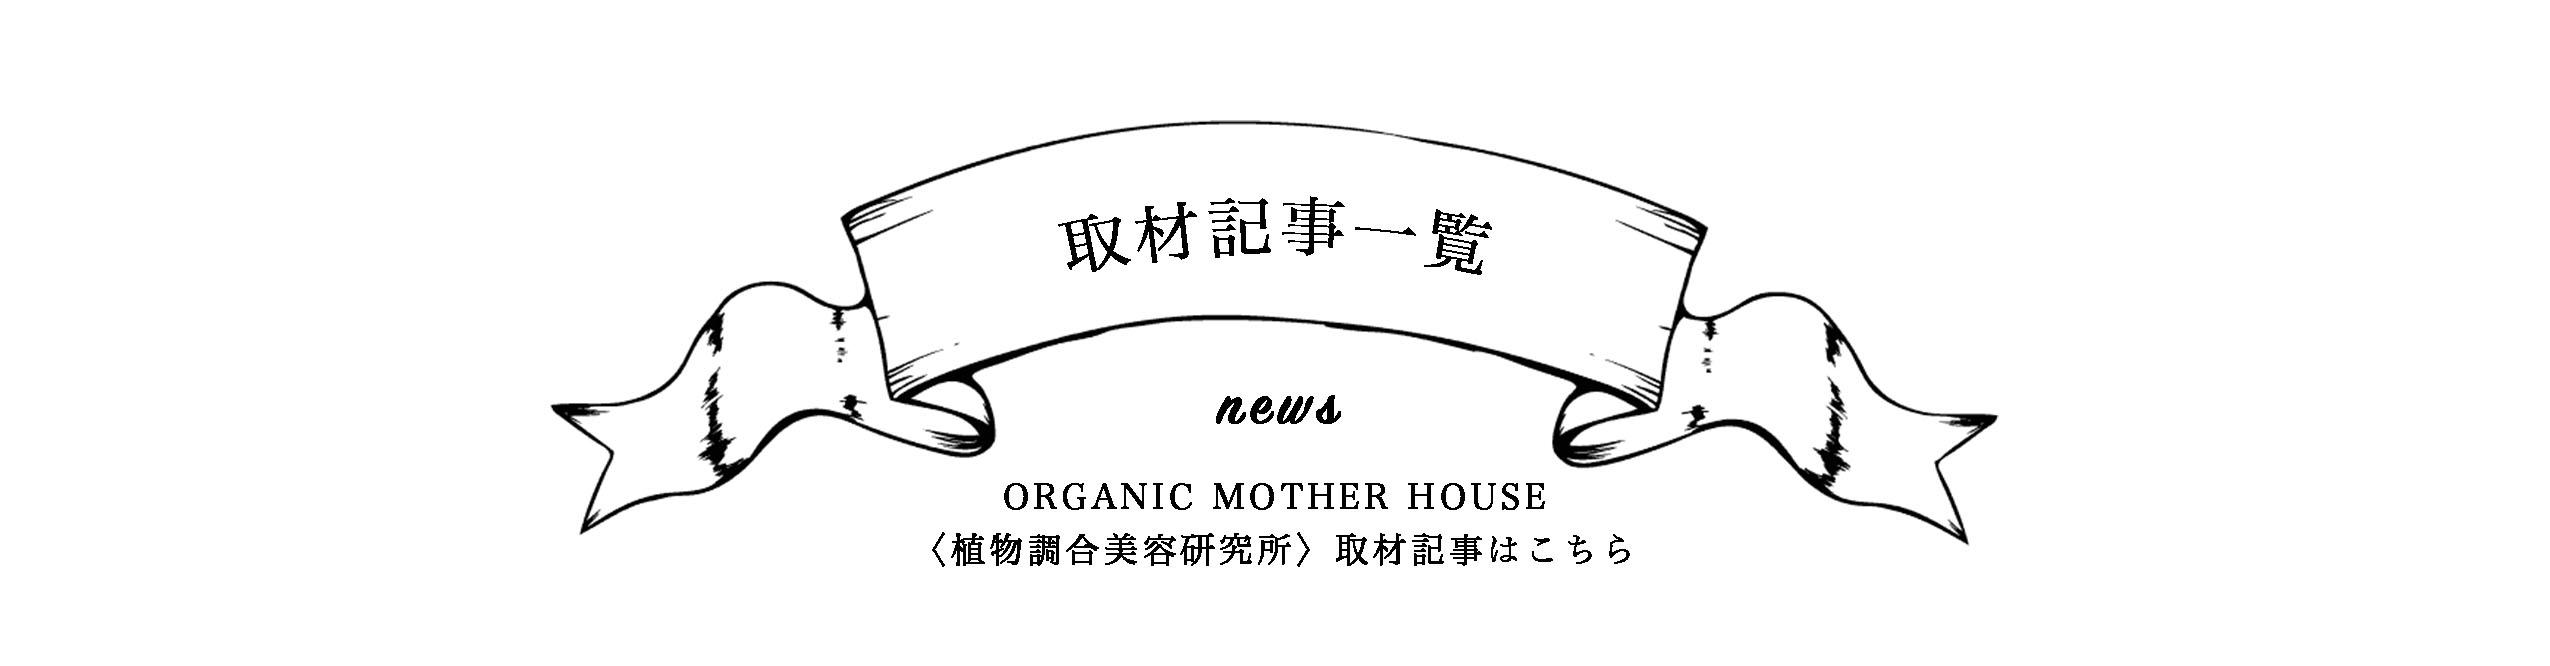 ORGANIC MOTHER HOUSE〈植物調合美容研究所〉記事